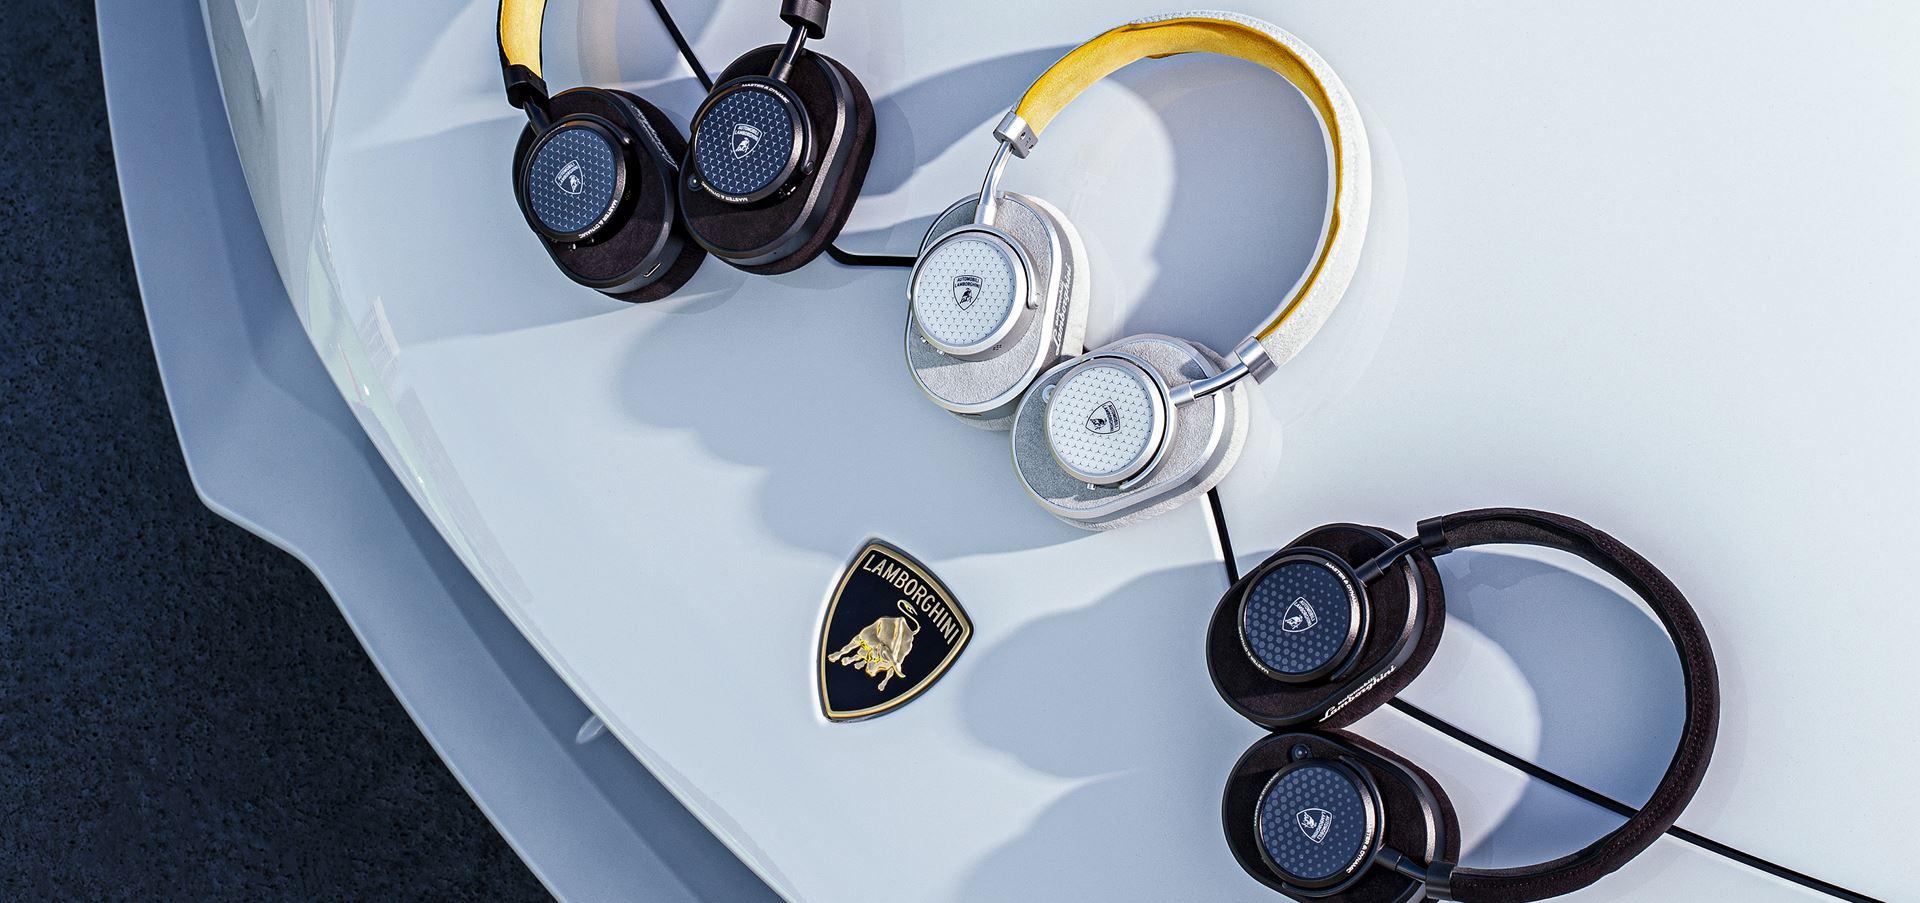 Automobili Lamborghini partners with Master & Dynamic...